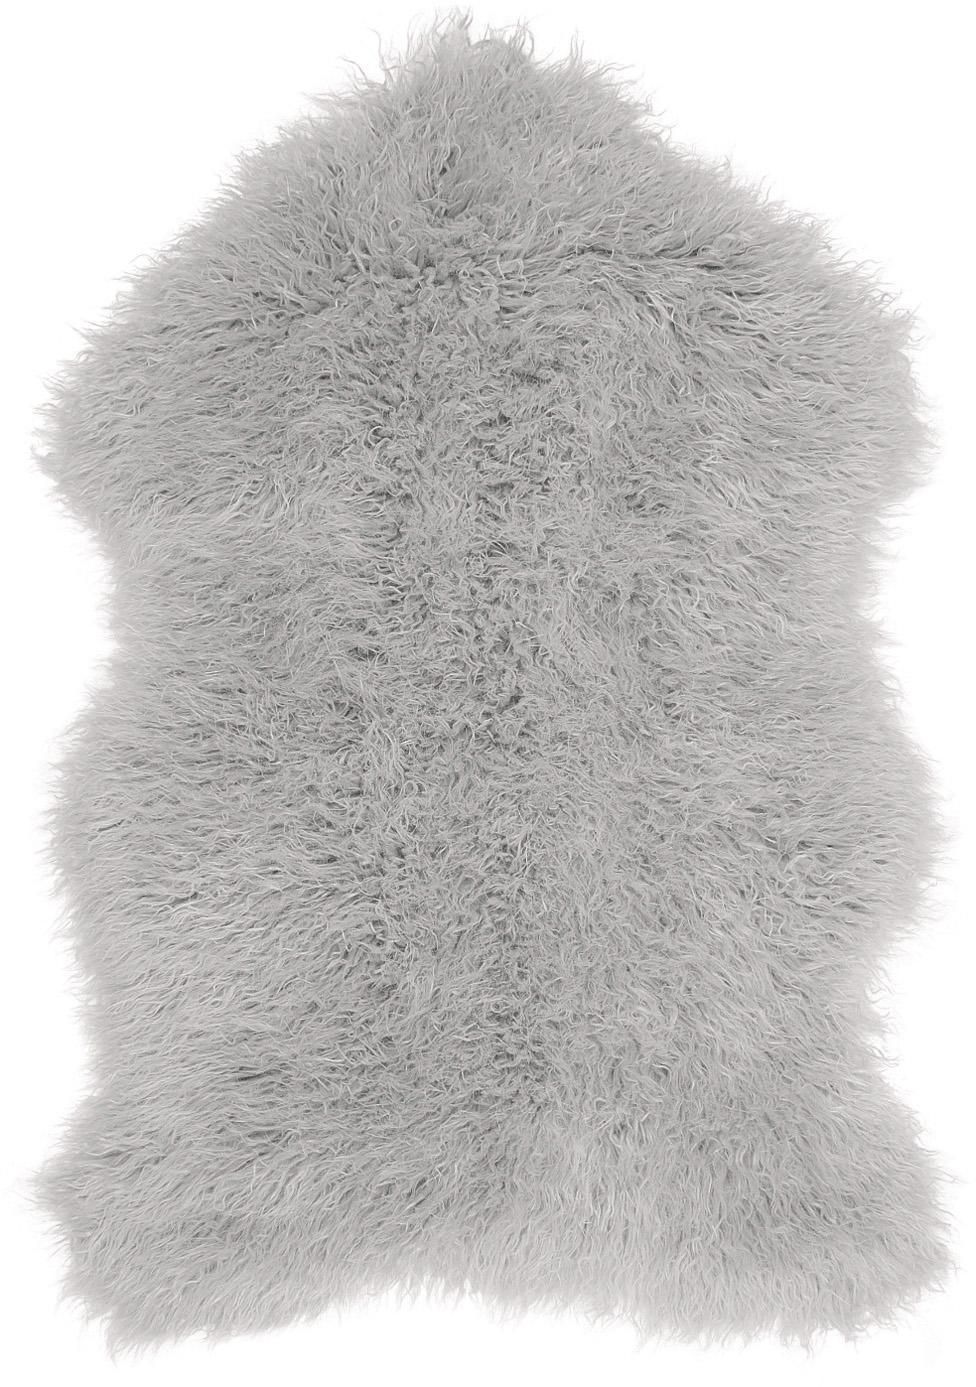 Kunstfell Morten, gelockt, Vorderseite: 67% Acryl, 33% Polyester, Rückseite: Polyester, Hellgrau, 60 x 90 cm